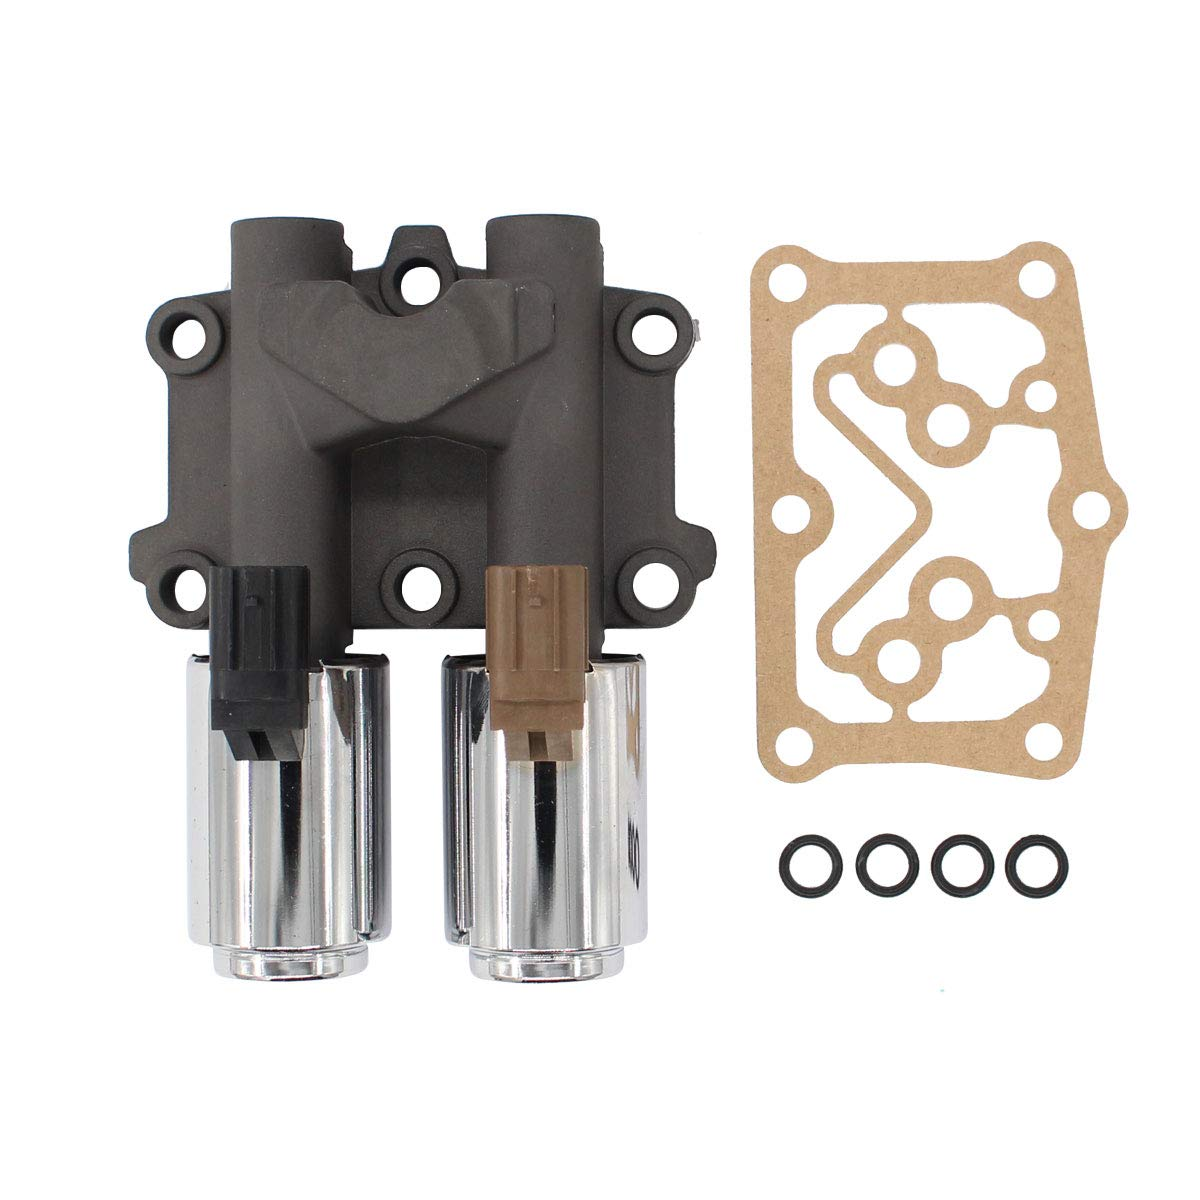 NewYall Transmission Dual Linear Solenoid w/Gasket & 4 O-Rings